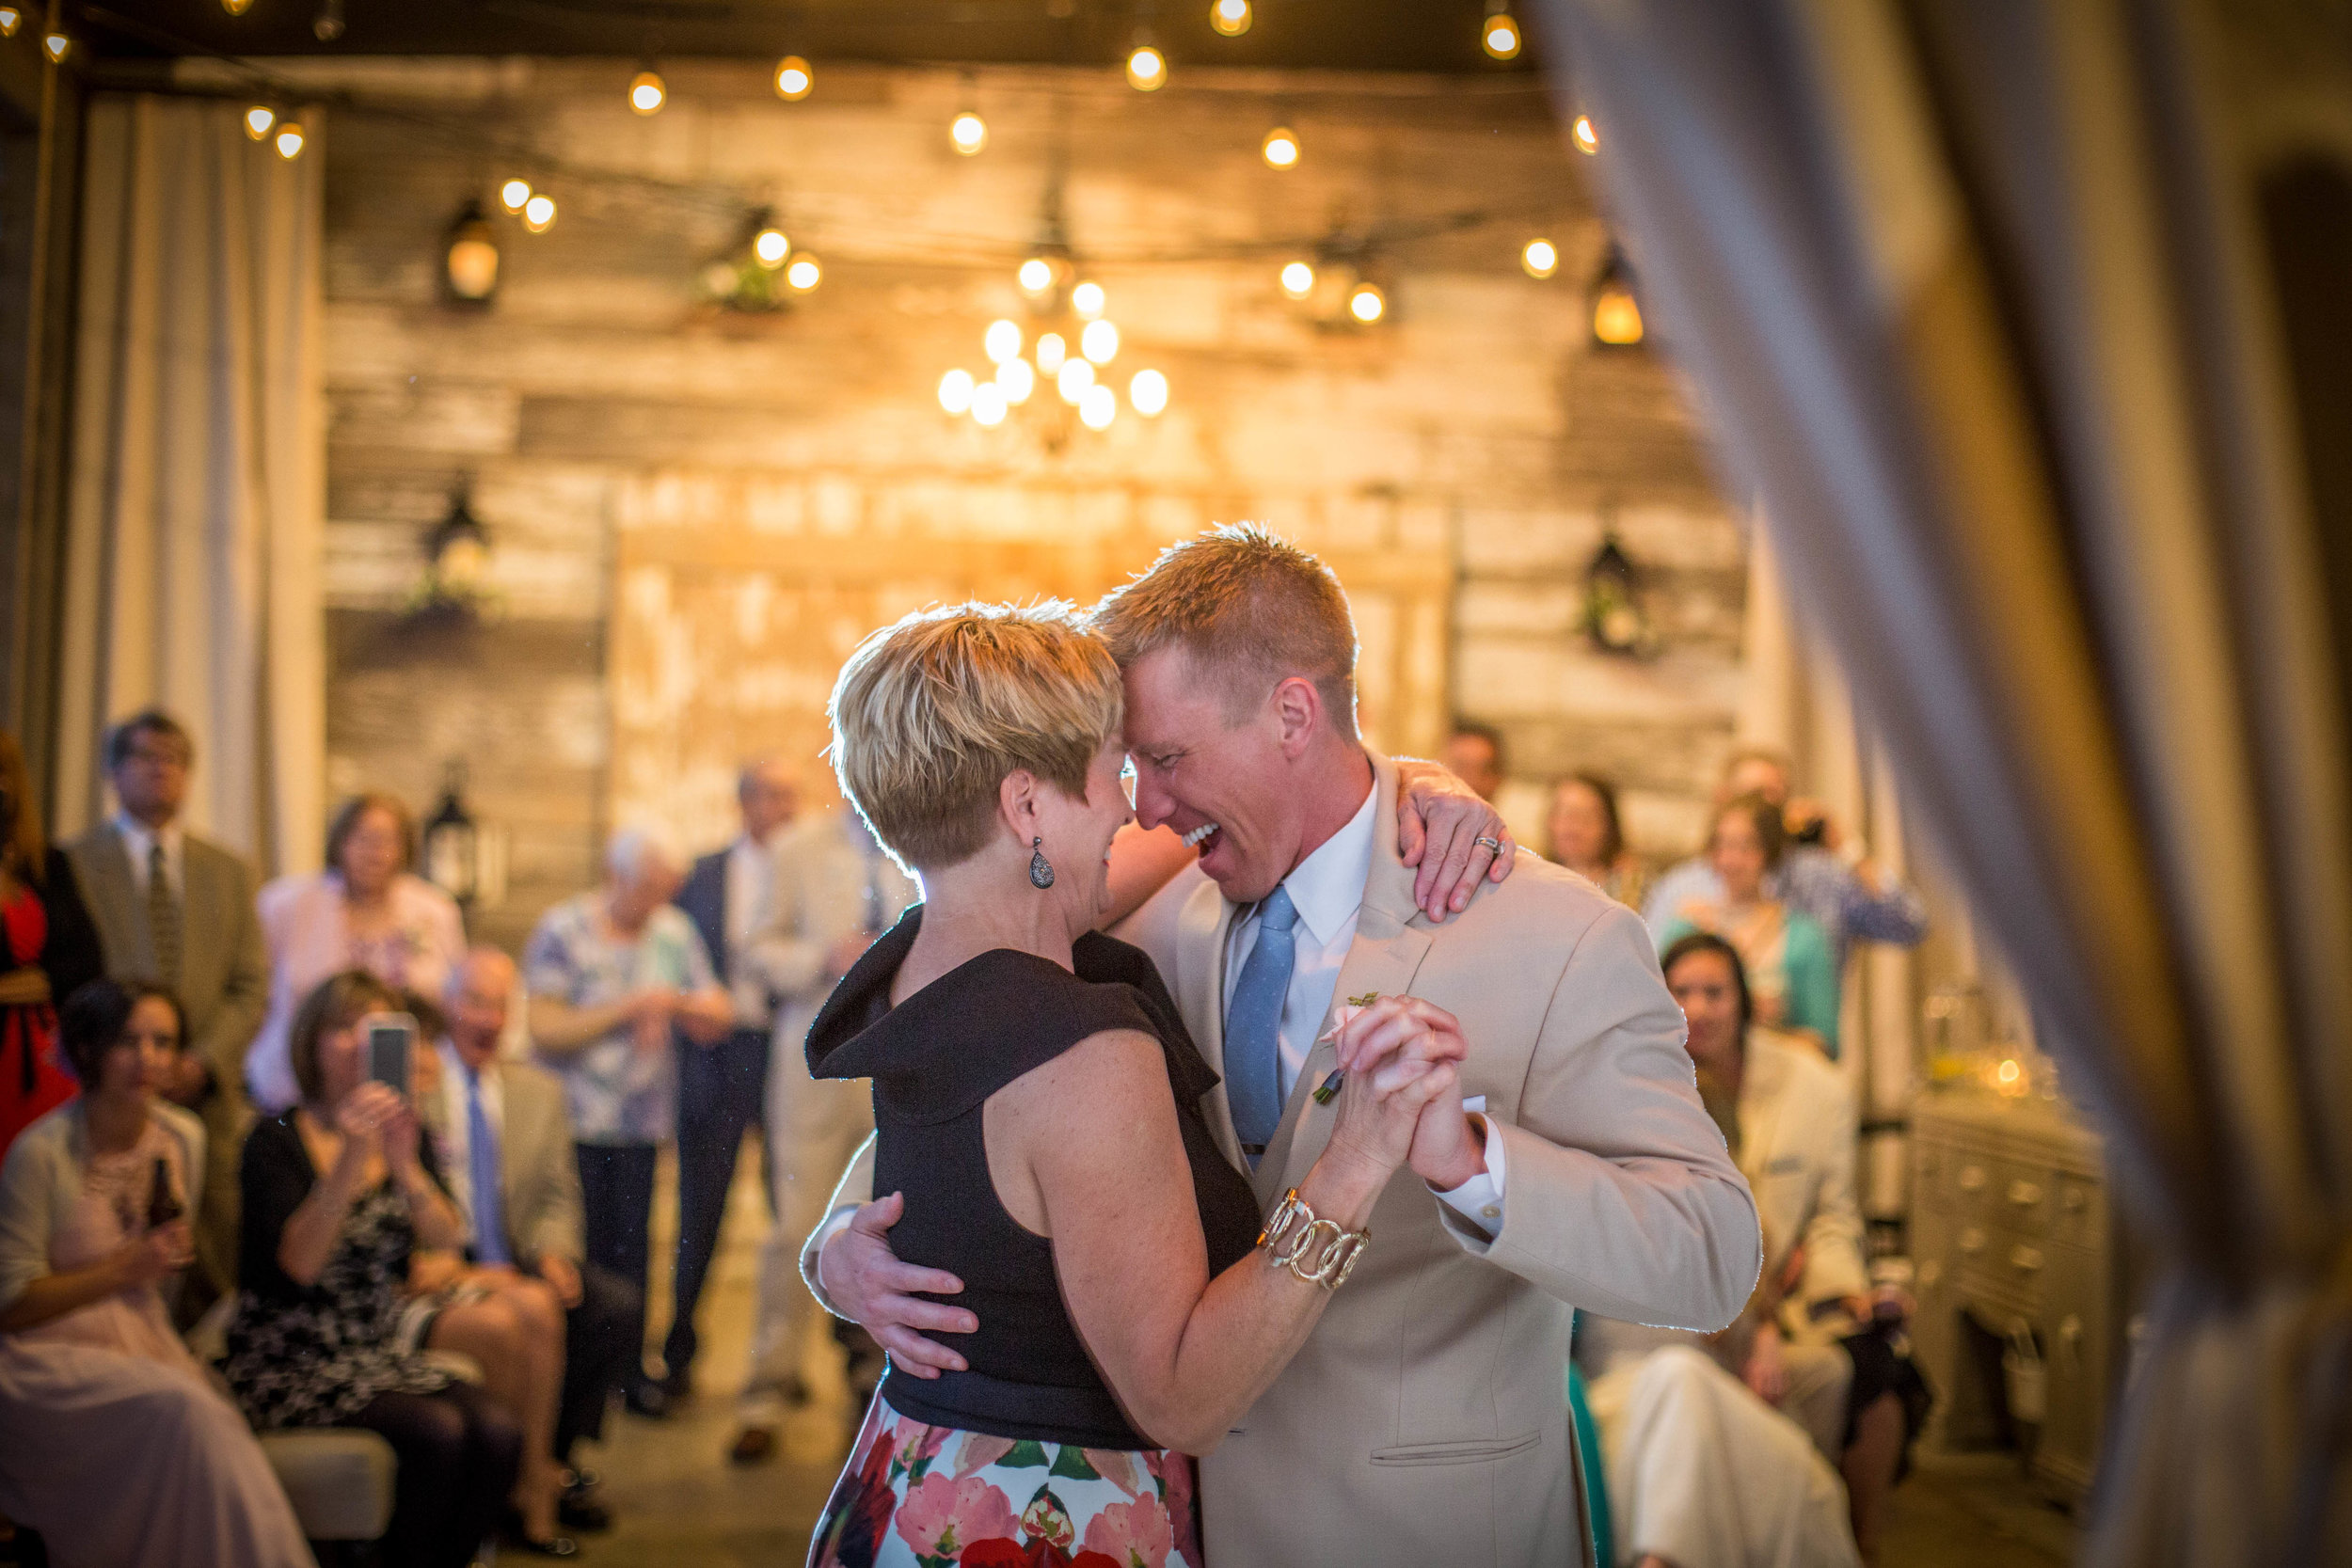 Kansas City-Small Wedding-Elope-Reception-Intimate-Ceremony-Megan & Jeff-253.jpg